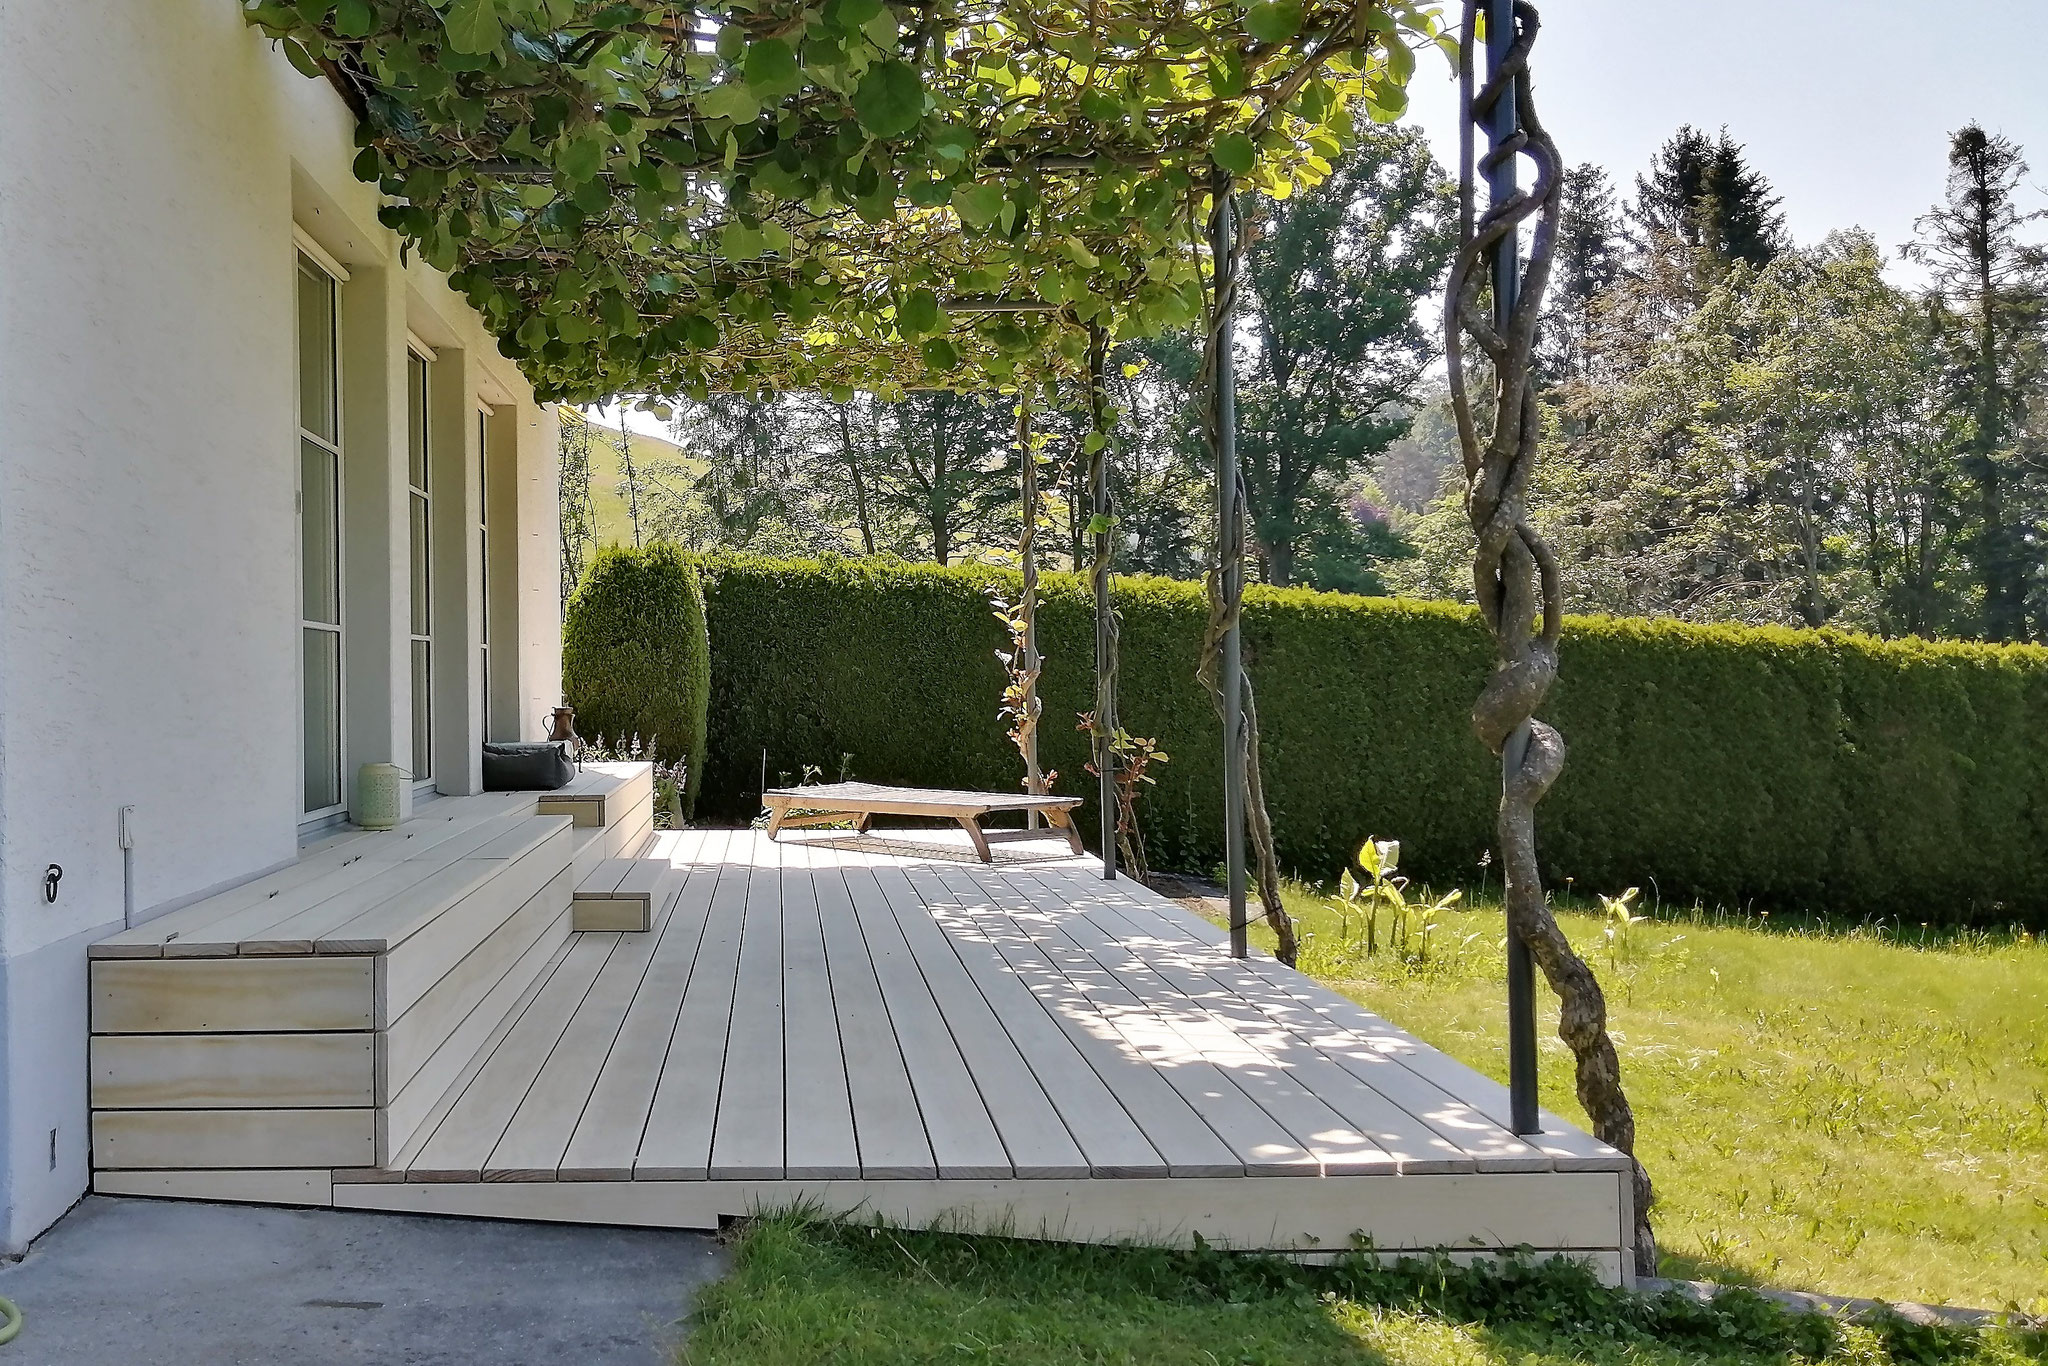 Terrasse aus Akoya-Holz